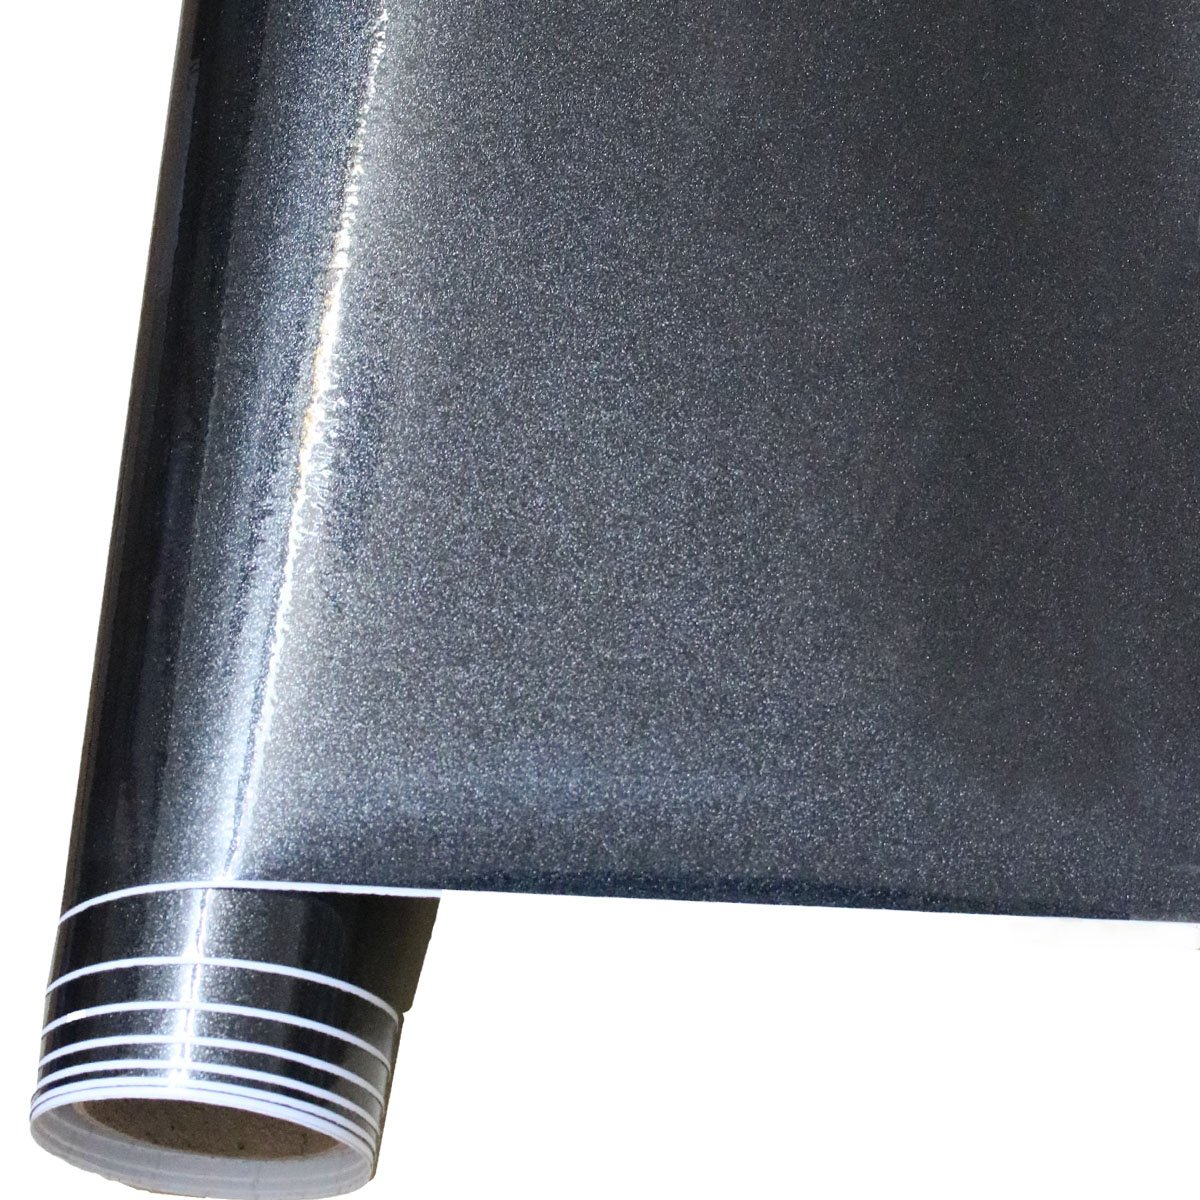 15.9 x 118 AllwaySmart EZPaper 9.8 feet Glossy metallic black contact paper for countertops self adhesive shelf paper vinyl wallpaper for dresser cabinet and car interior decor